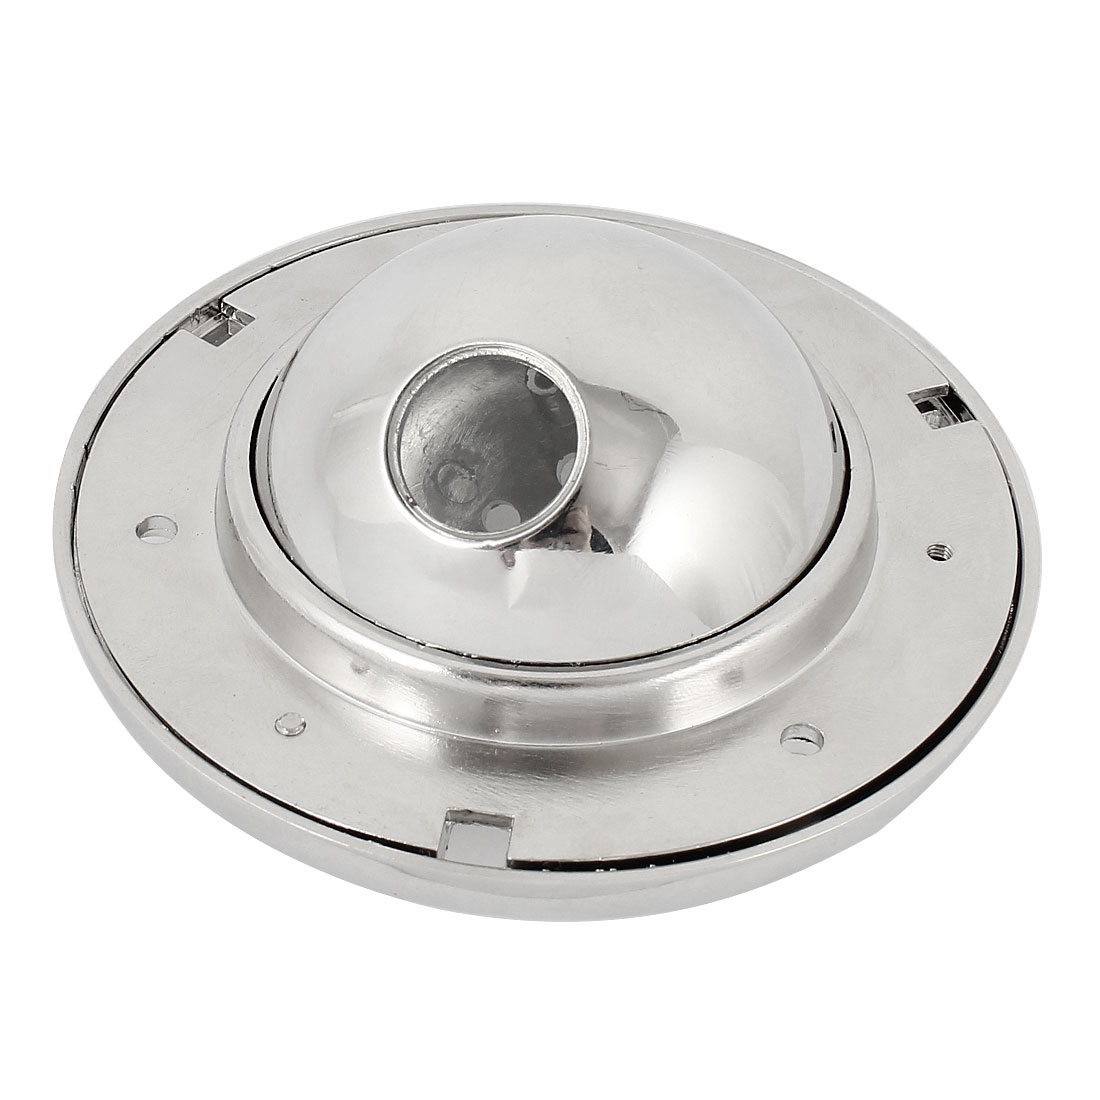 Elevator UFO Shaped Aluminum CCTV Dome Camera Housing Case 10cm Dia